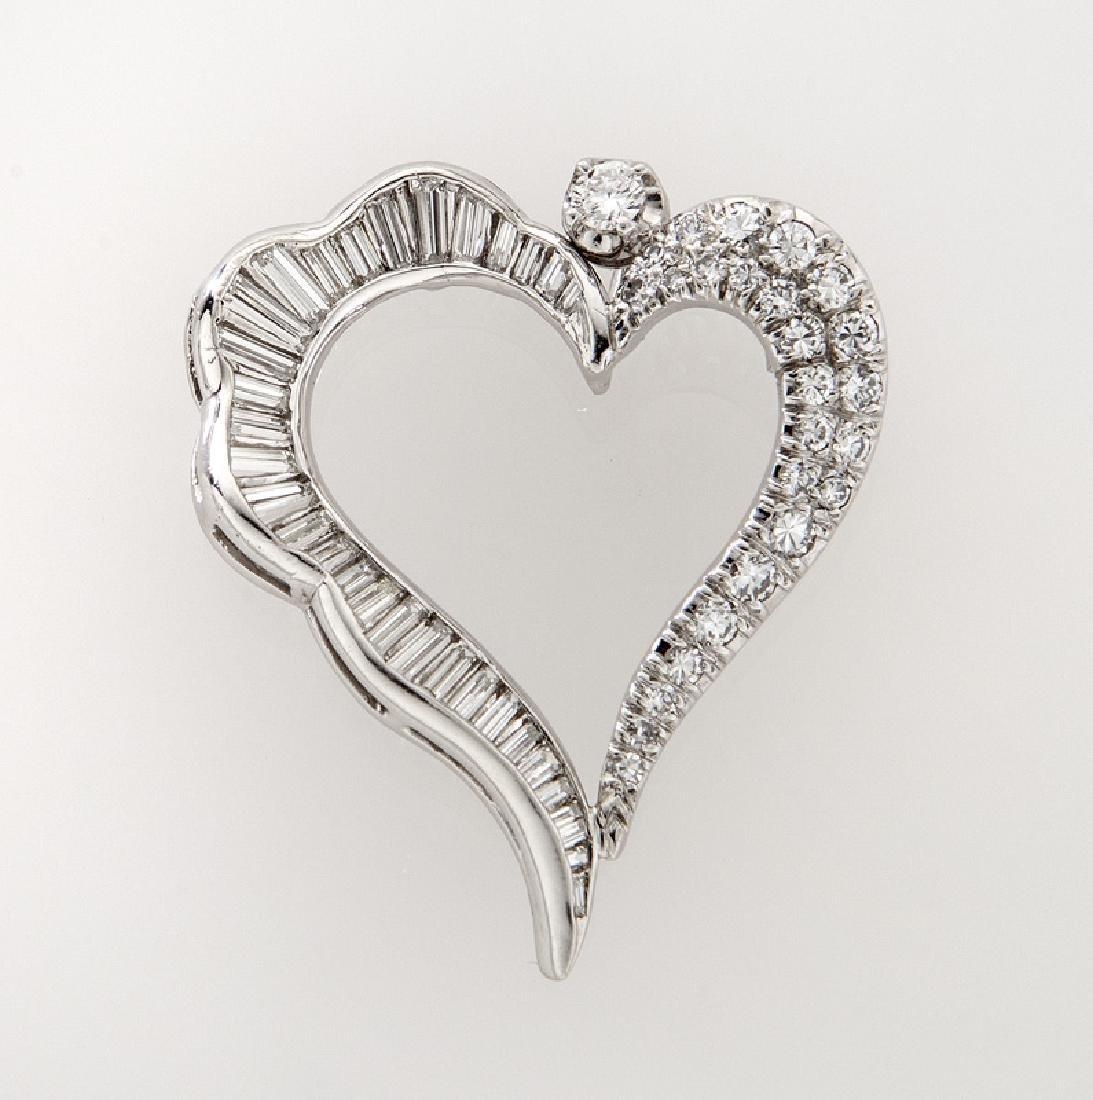 14K white gold and diamond heart pendant.